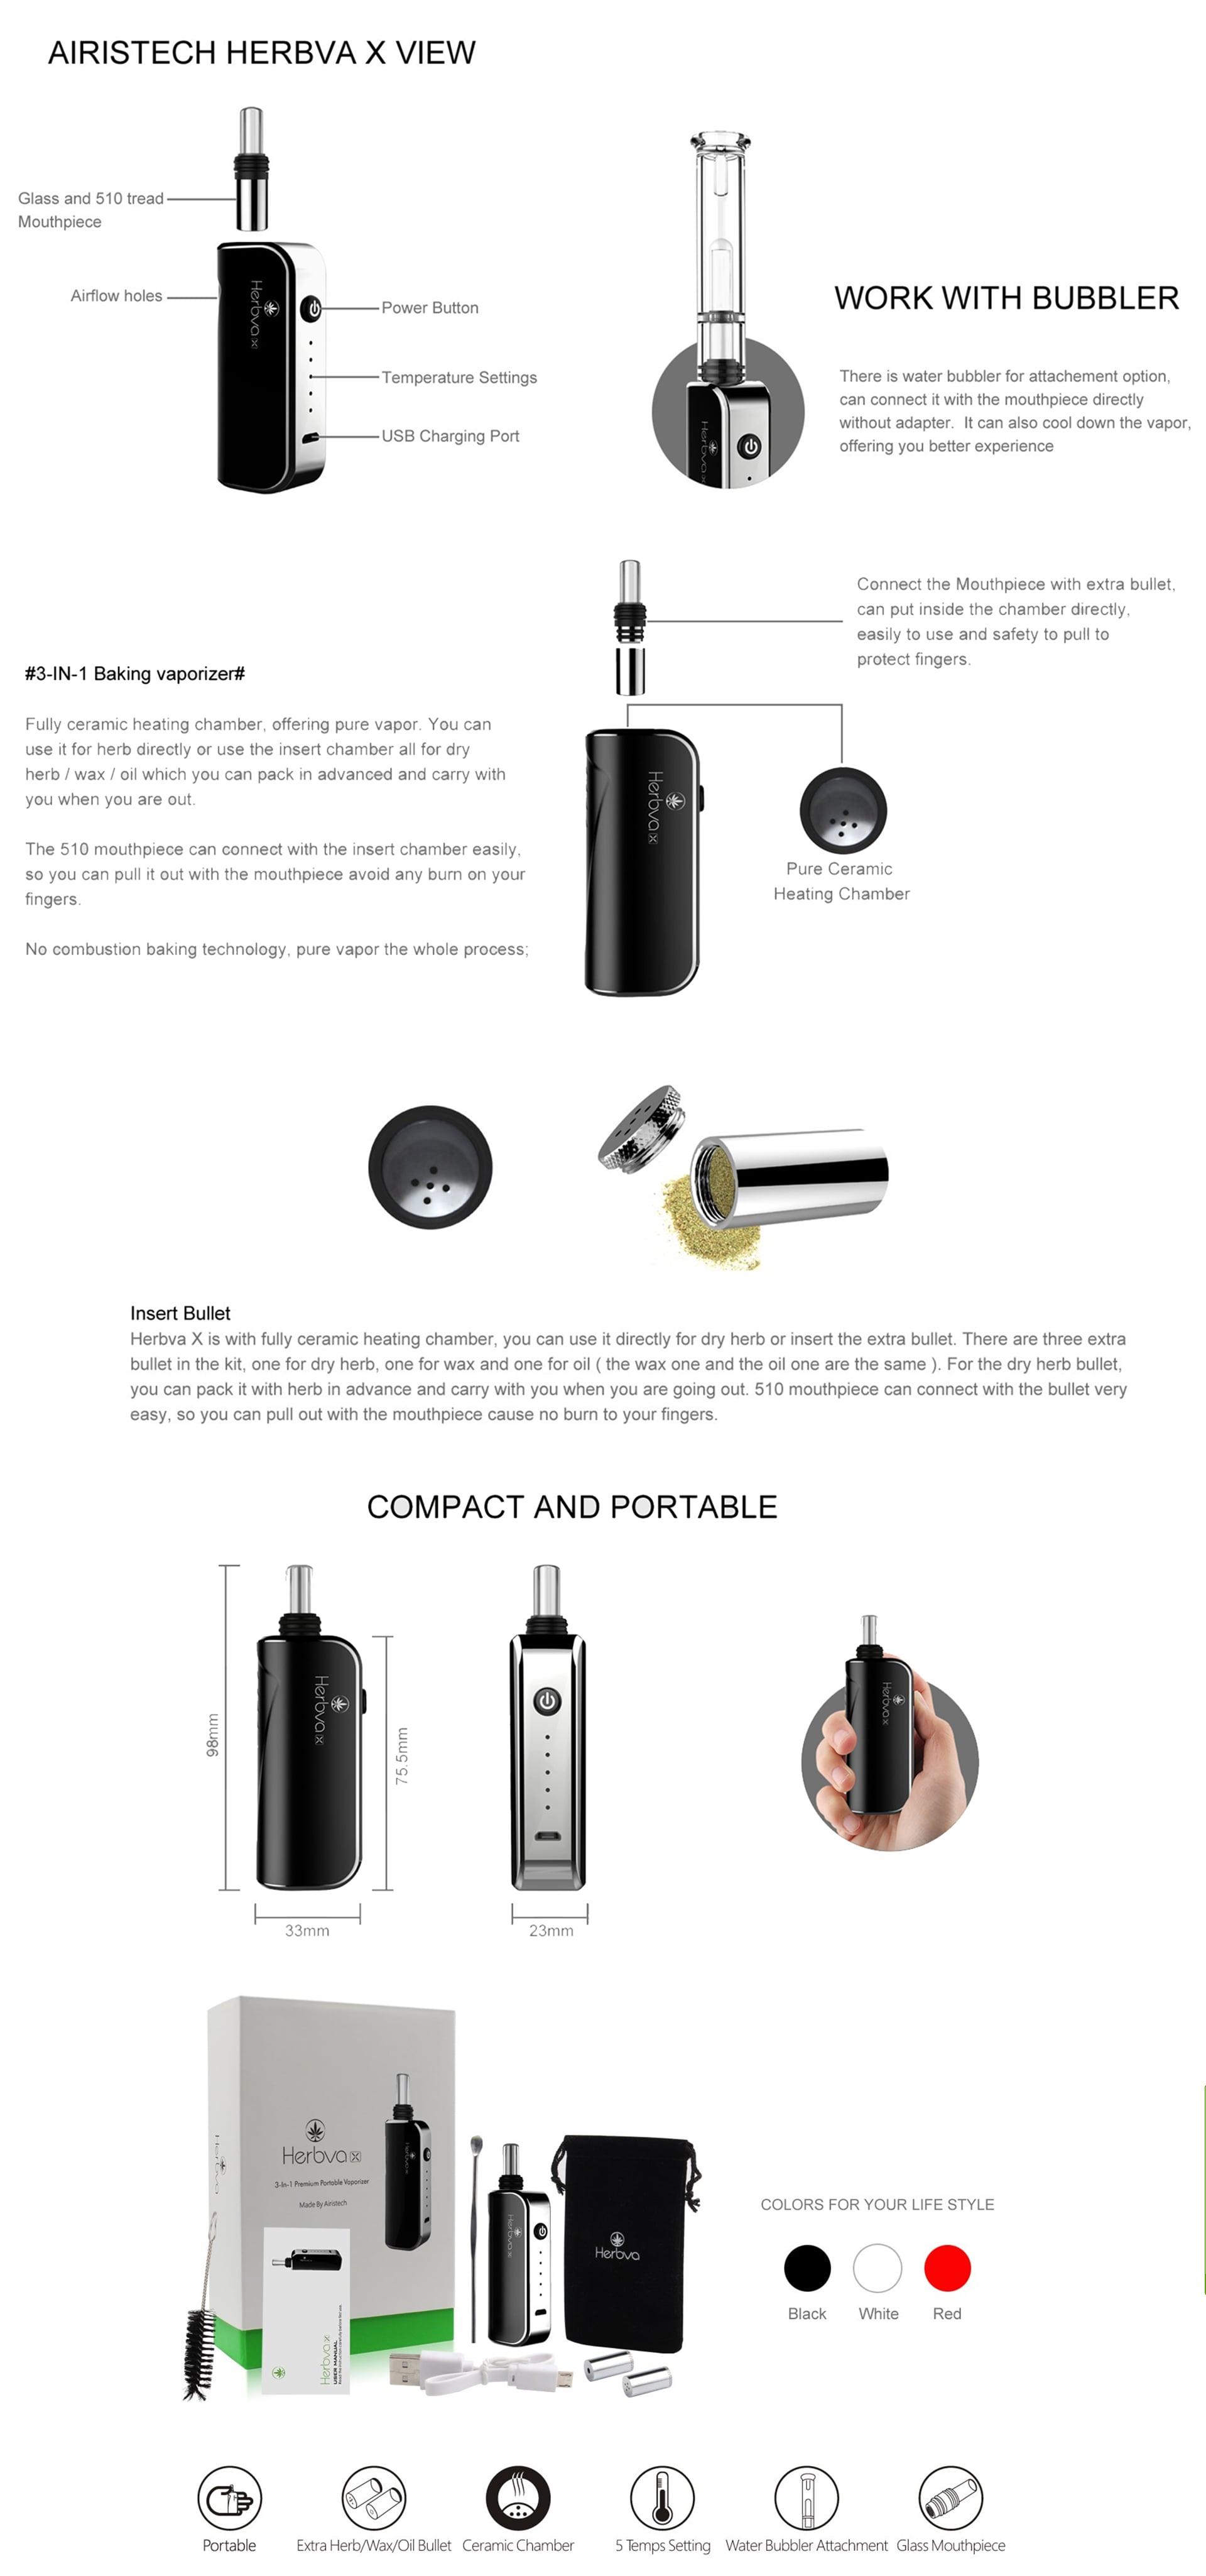 Airistech Herbva X 3-in-1 vaporizer product summary